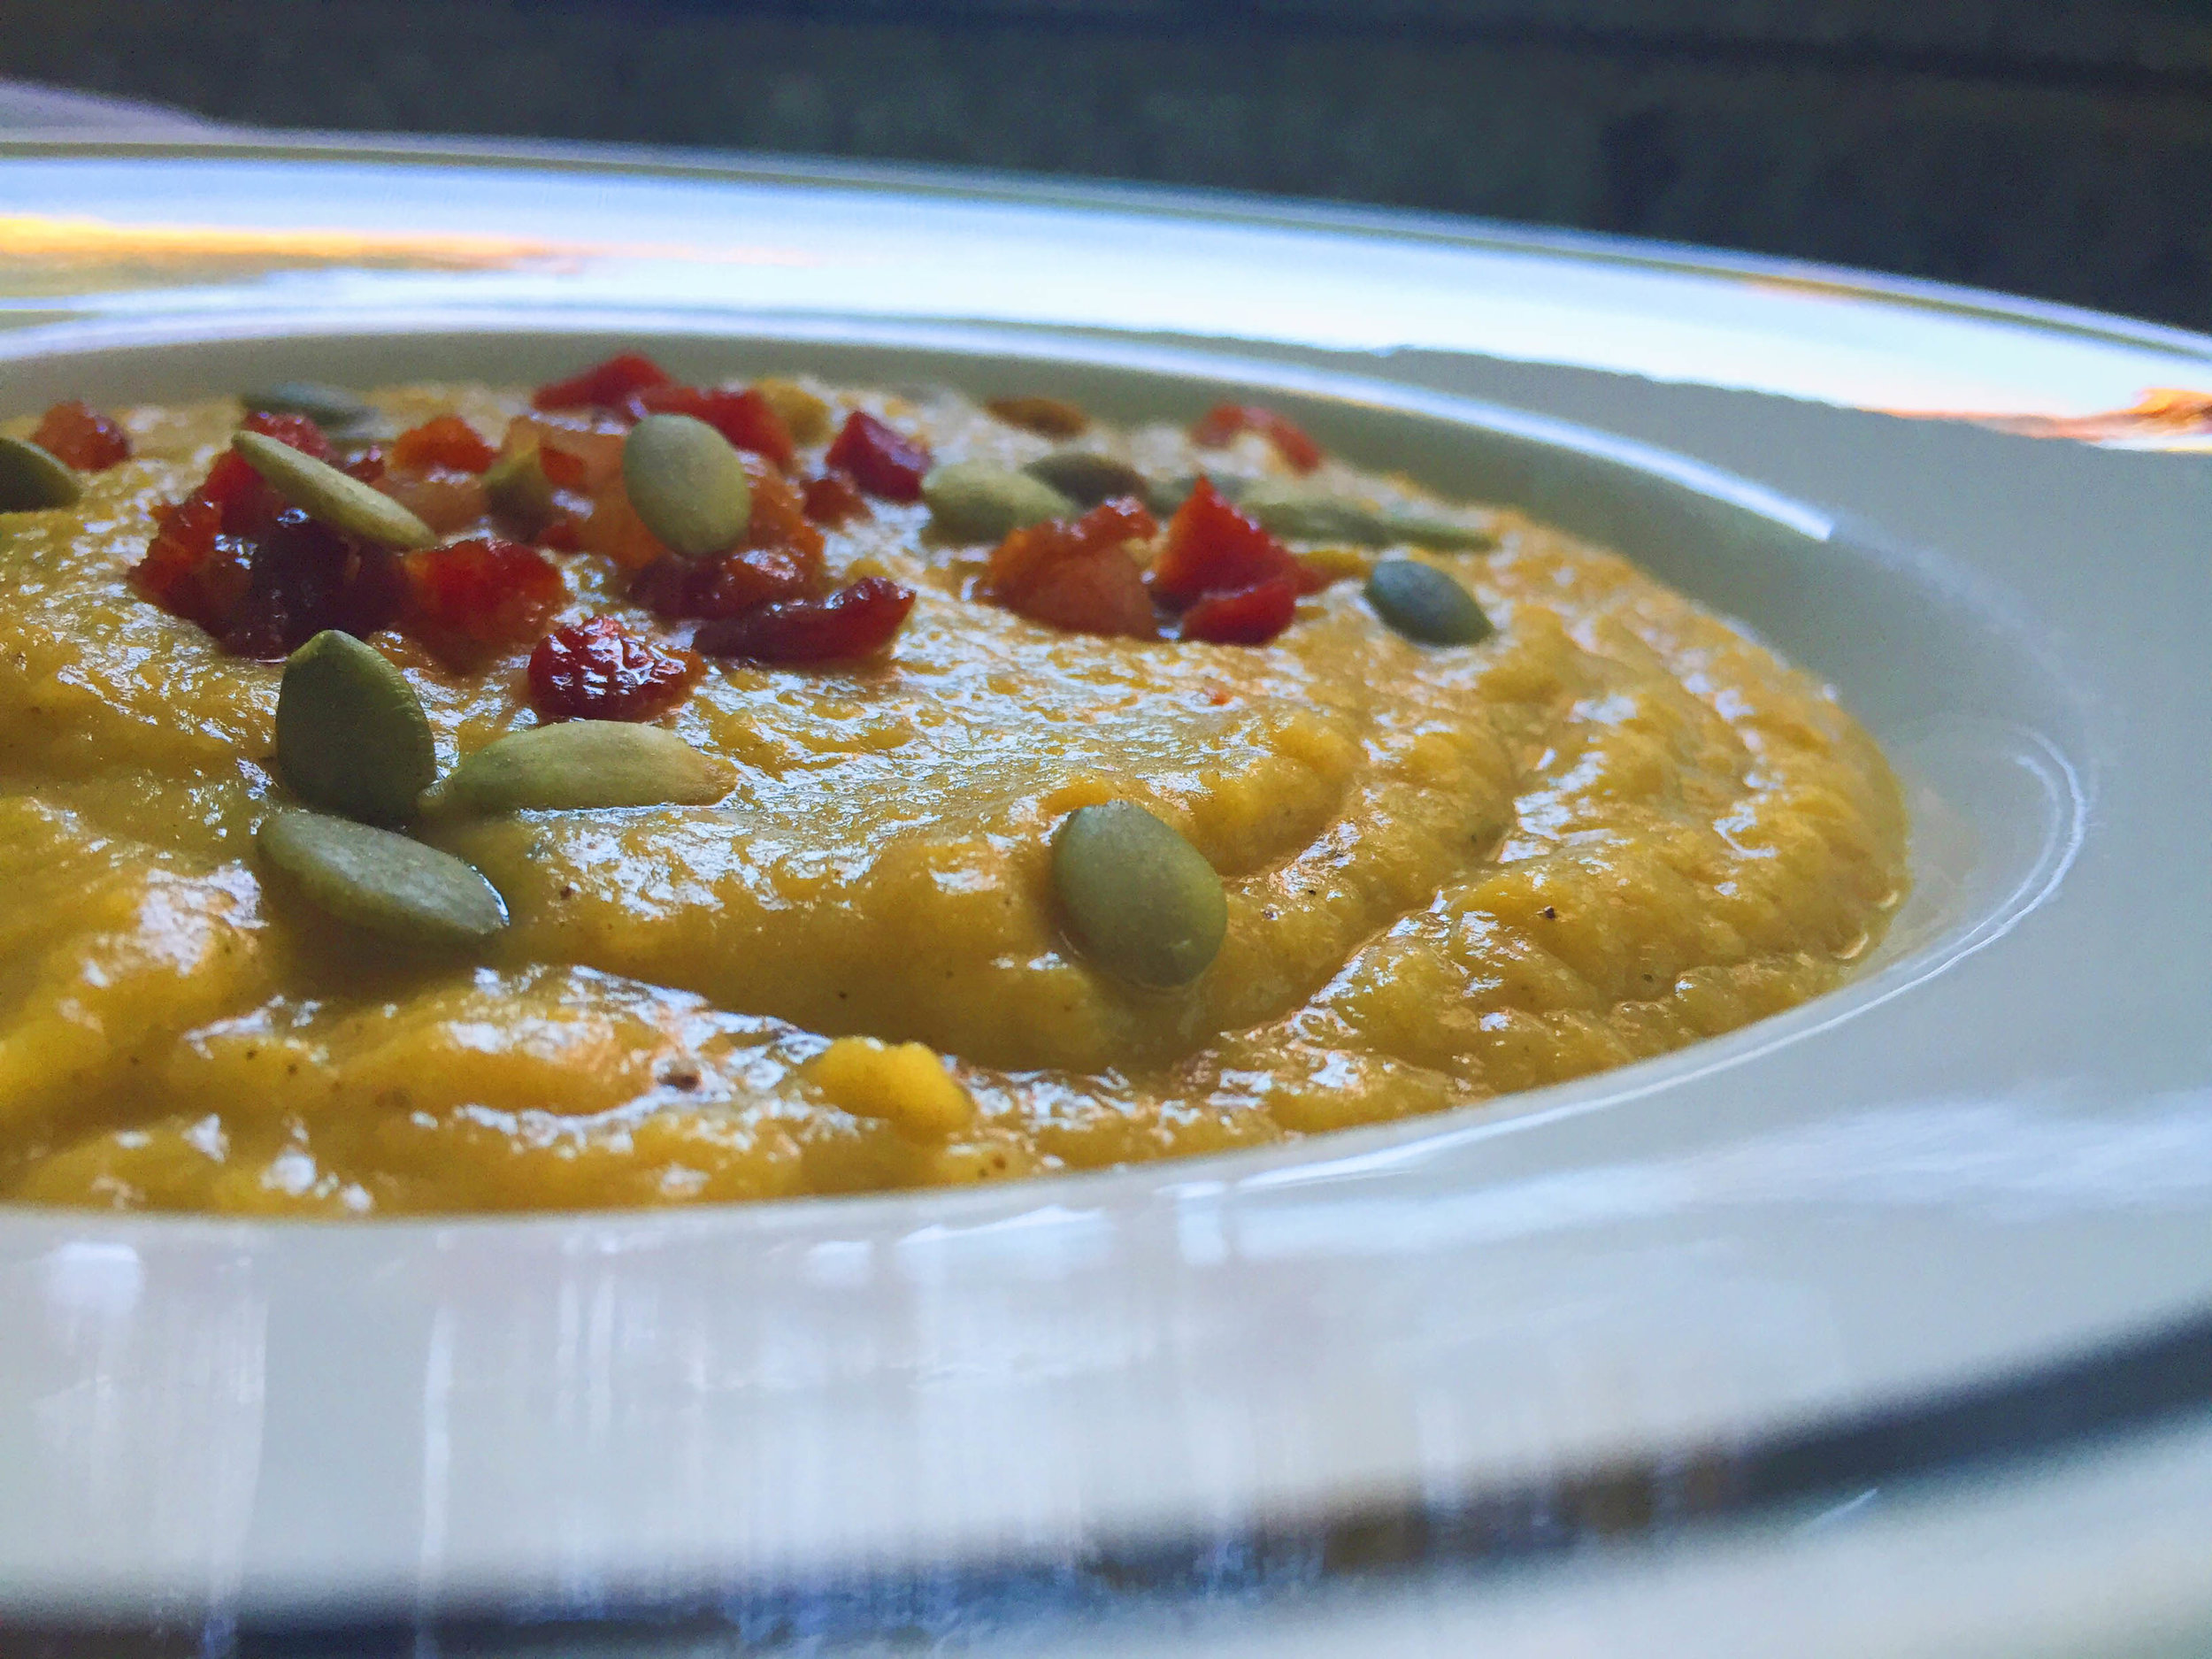 roasted_veggies_salad_chicken_main-125.jpg